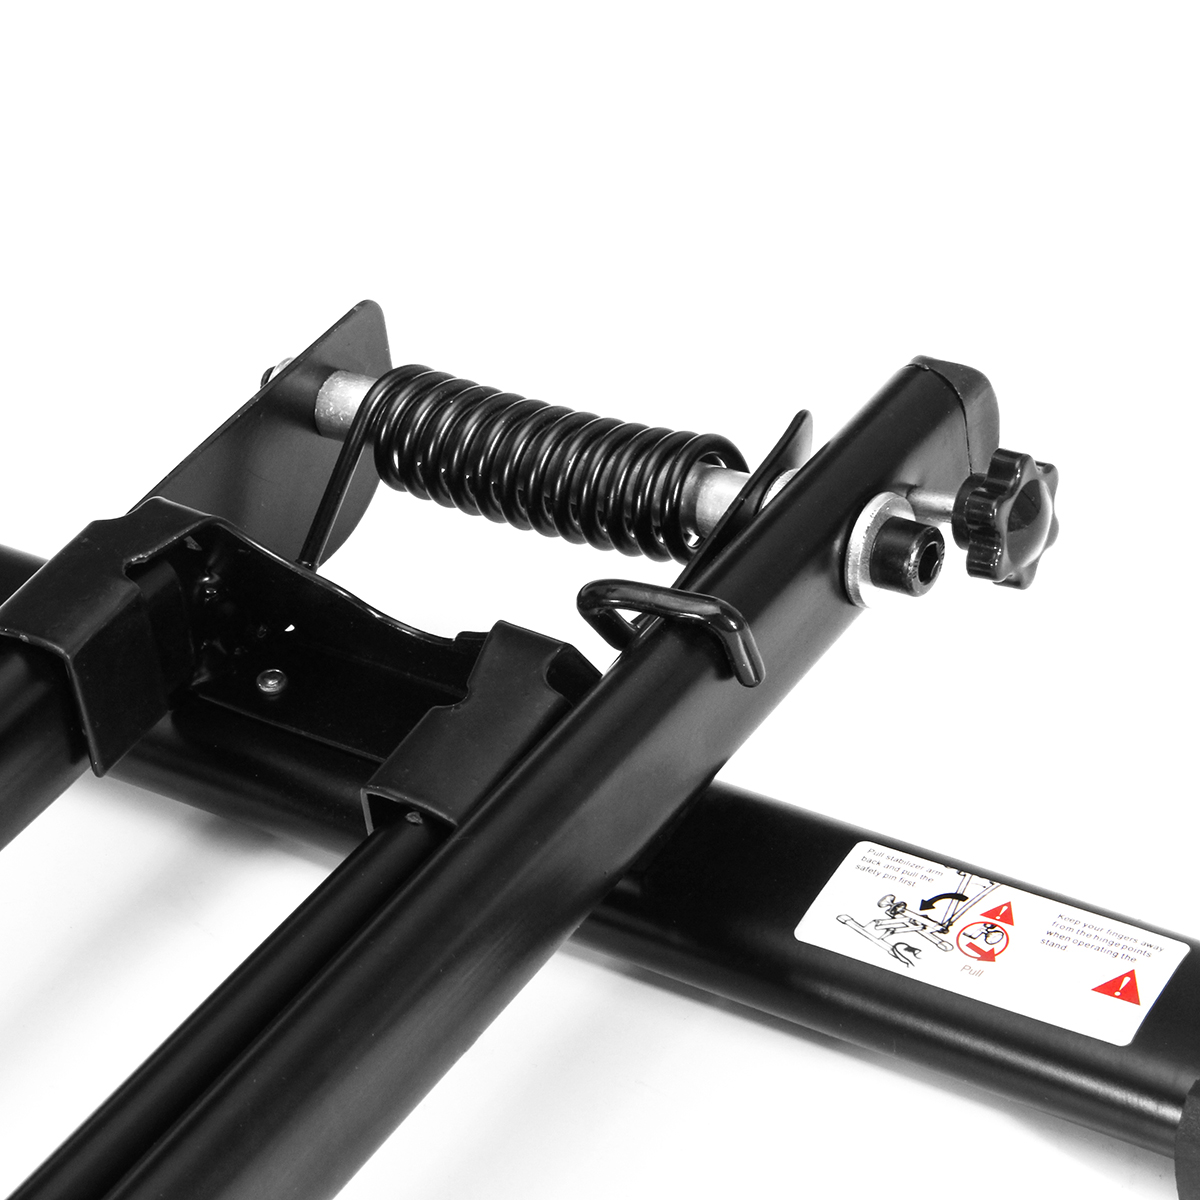 BIKIGHT L Type Folding Floor Bike Stand Adjustable Parking Rack Bicycle Storage